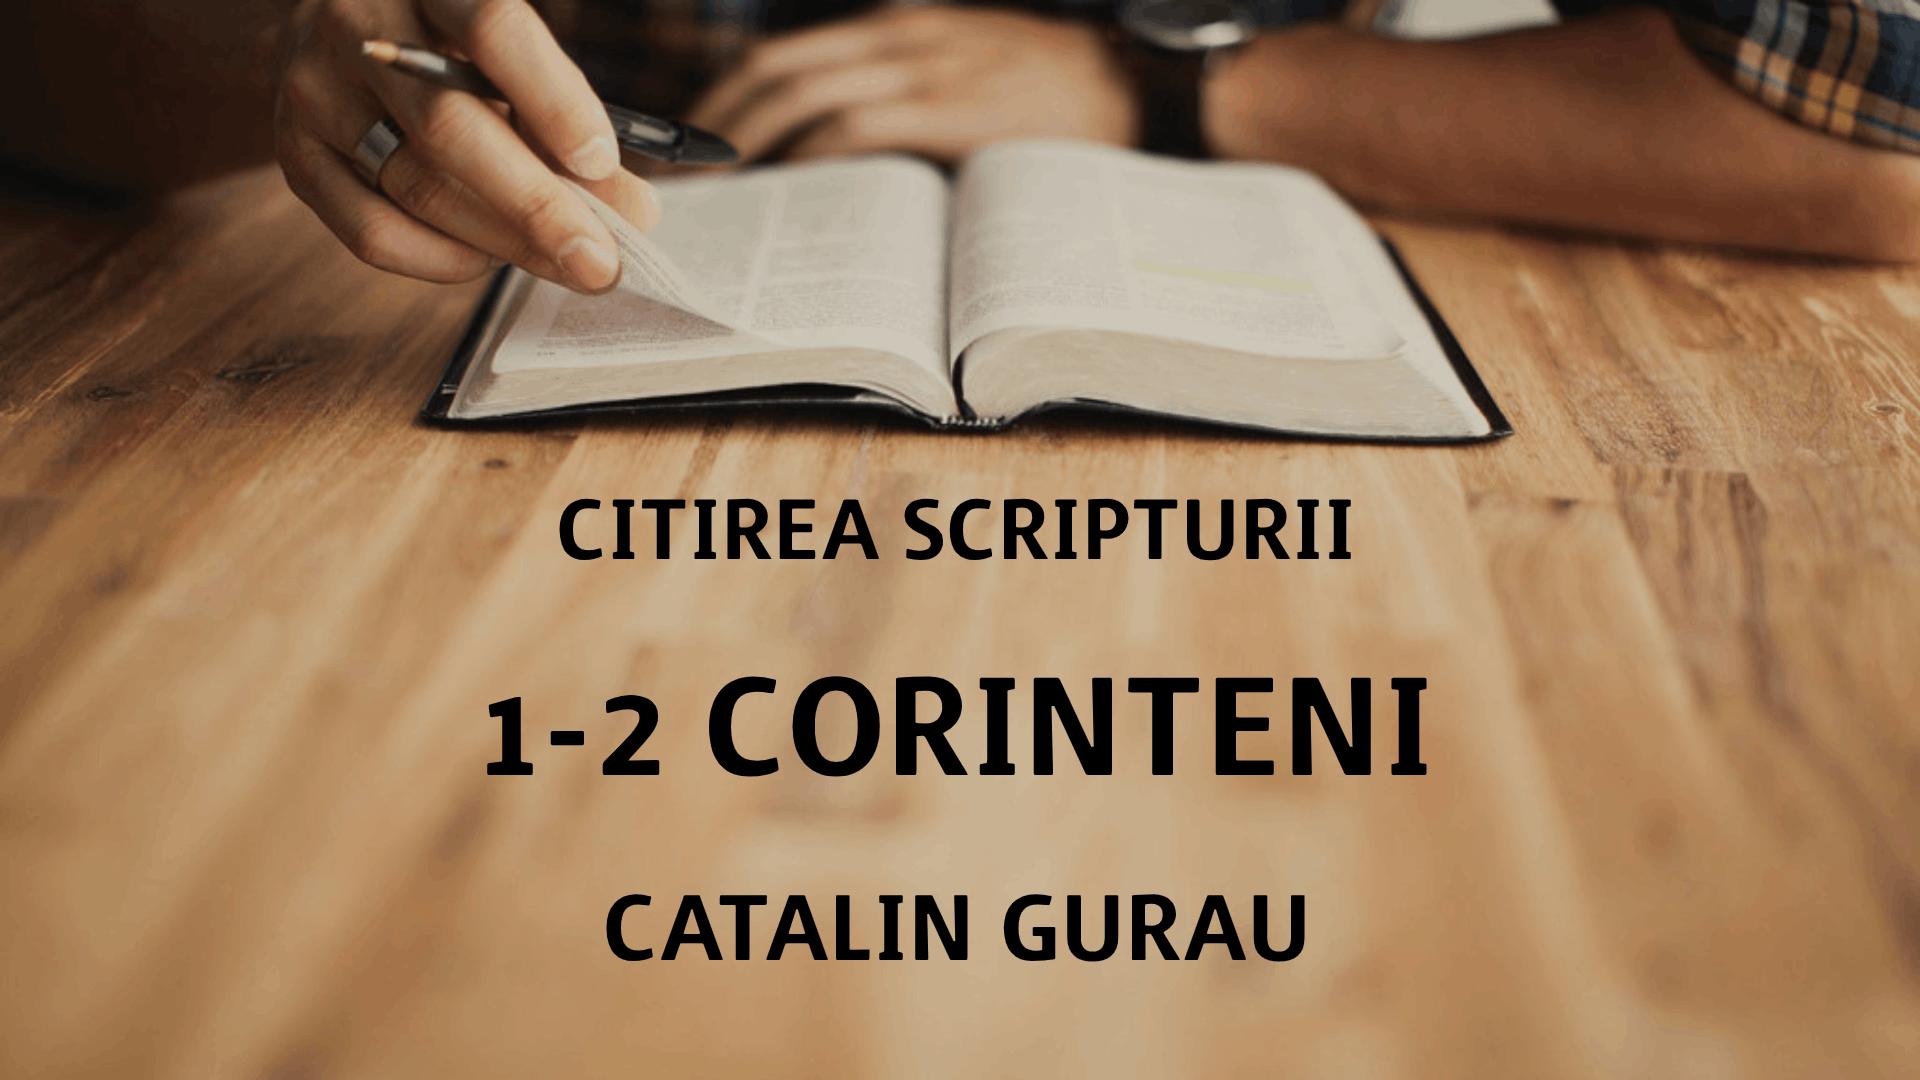 Citirea Scripturii - 1-2 Corinteni - Catalin Gurau